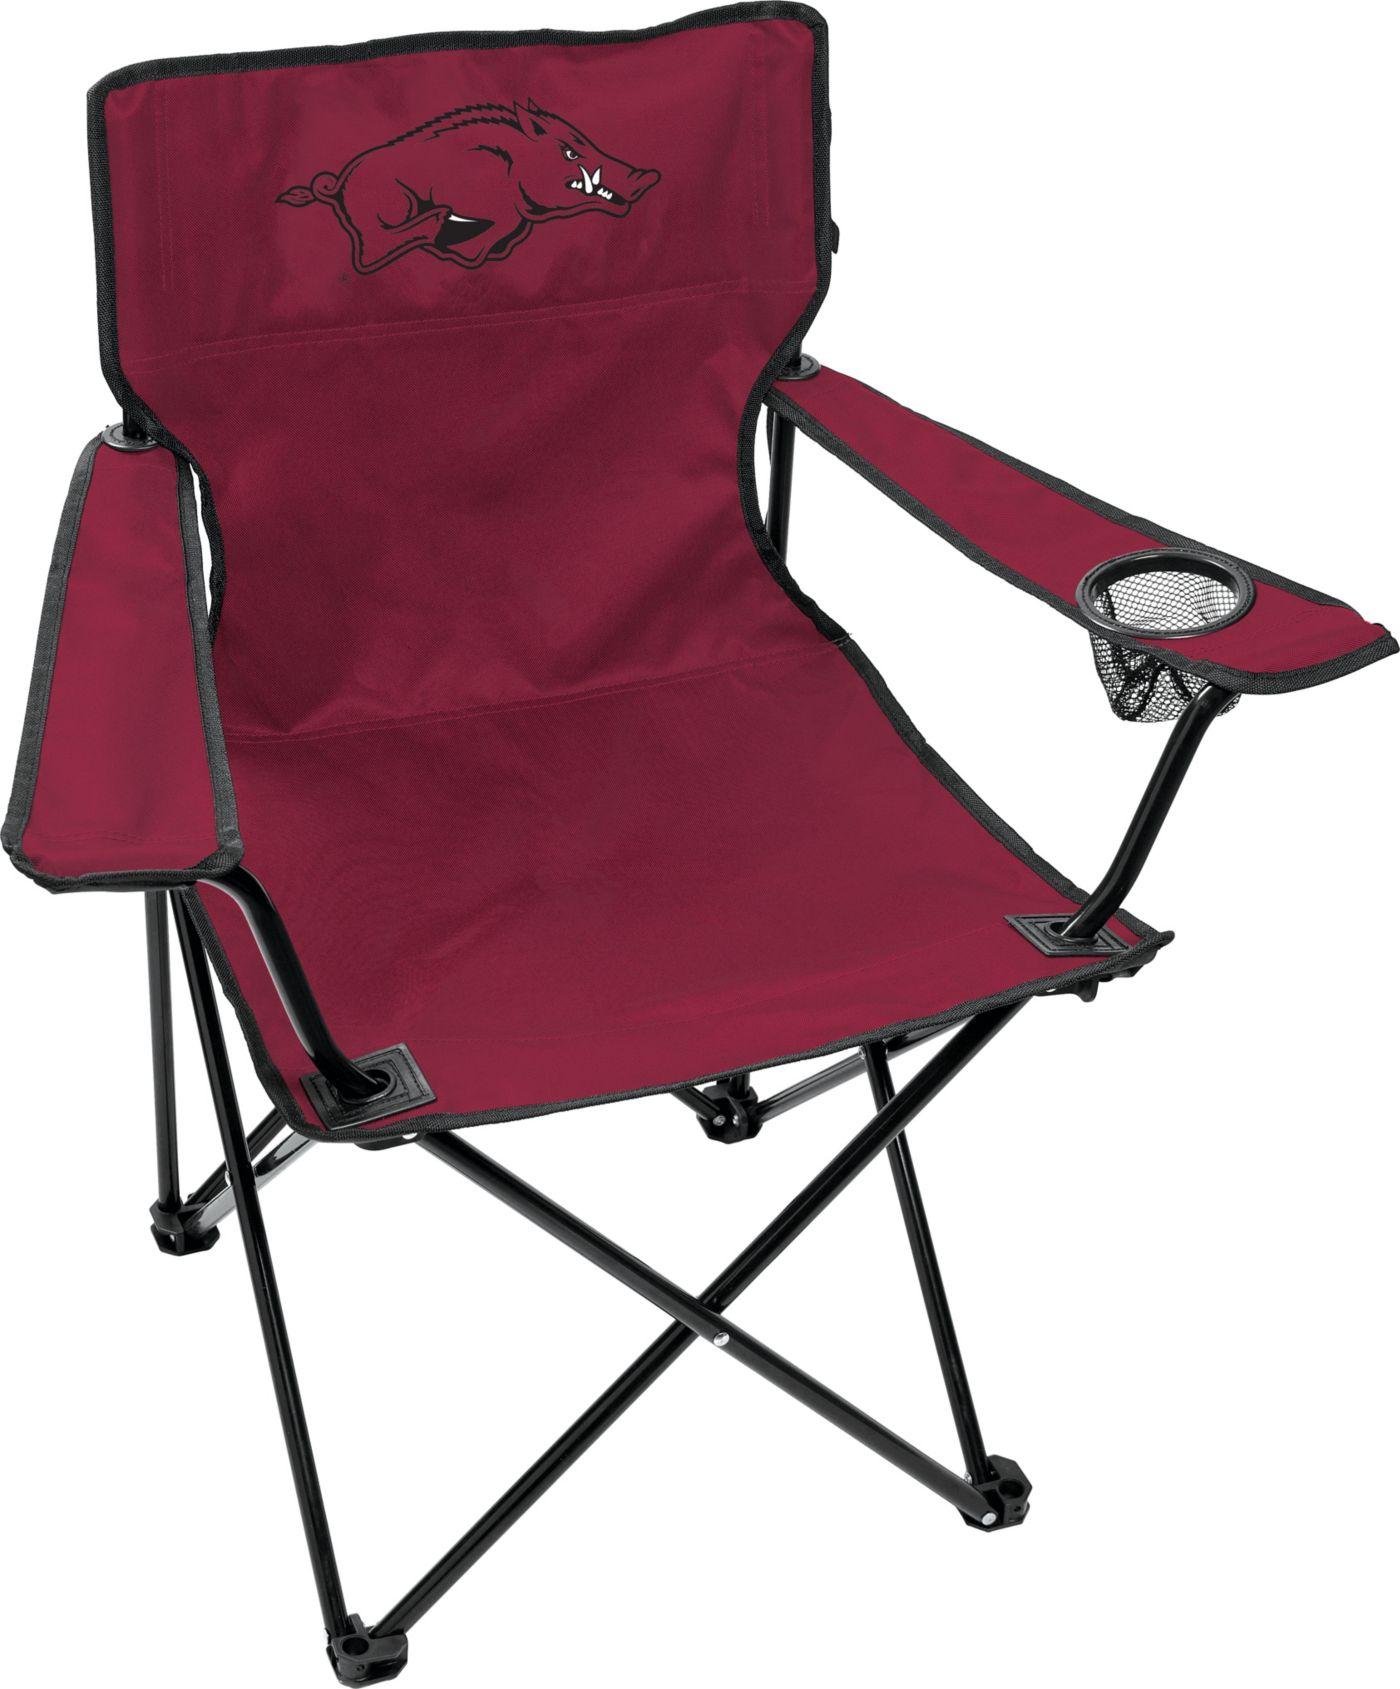 Rawlings Arkansas Razorbacks Game Changer Chair